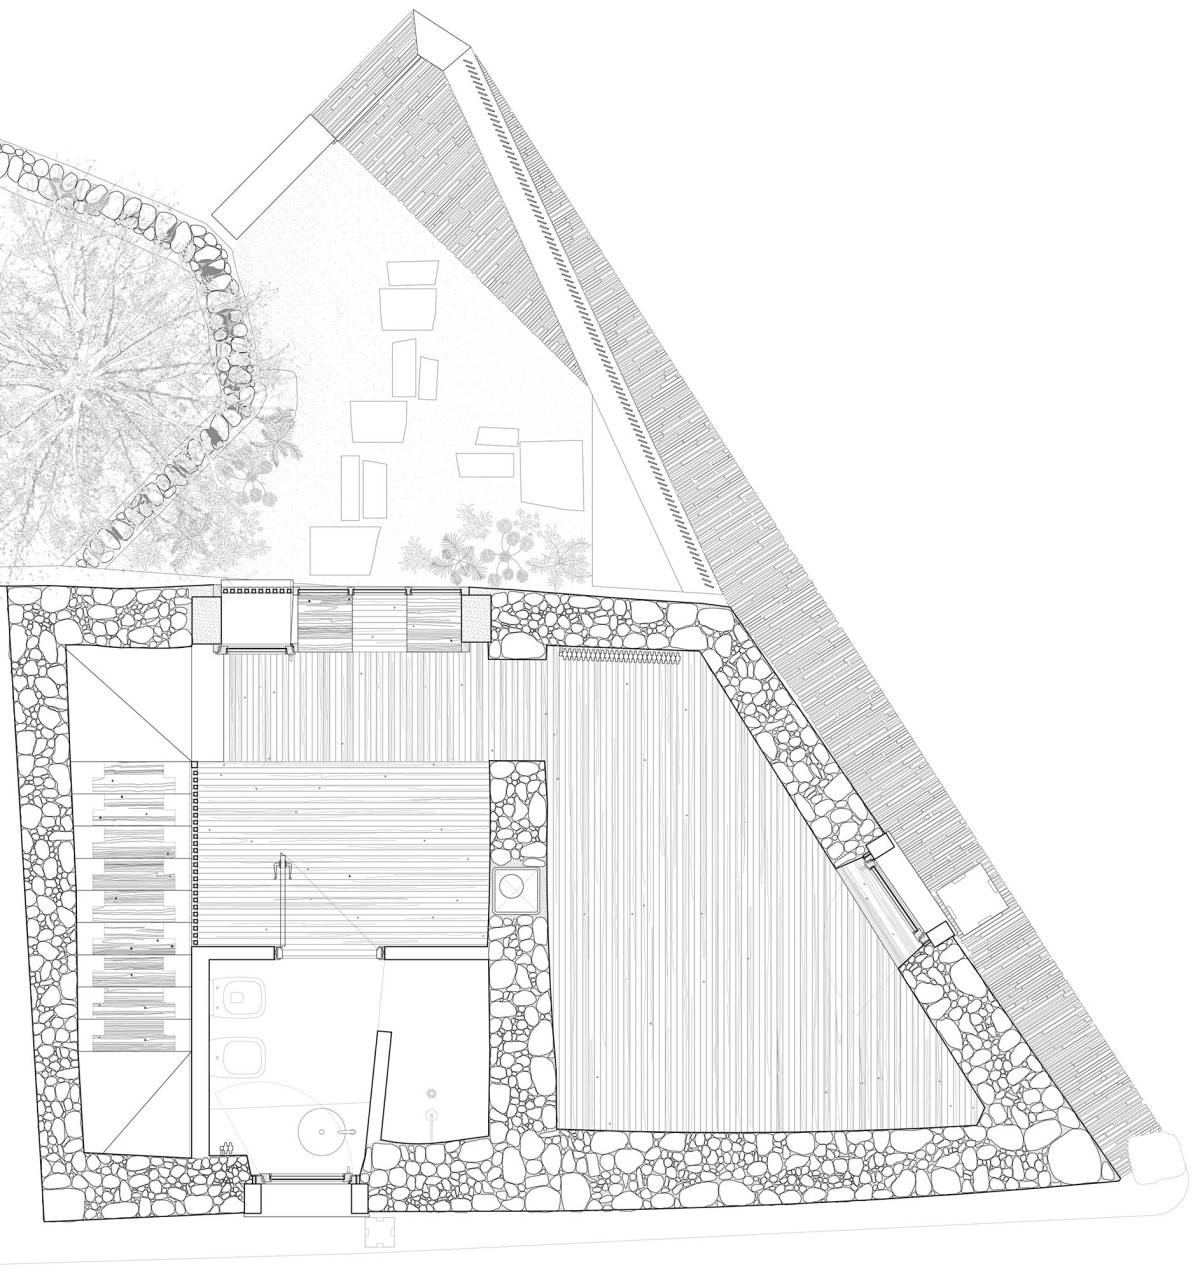 Zarcola Architetti . Castello house . Tregnago afasia DSL studio (18)